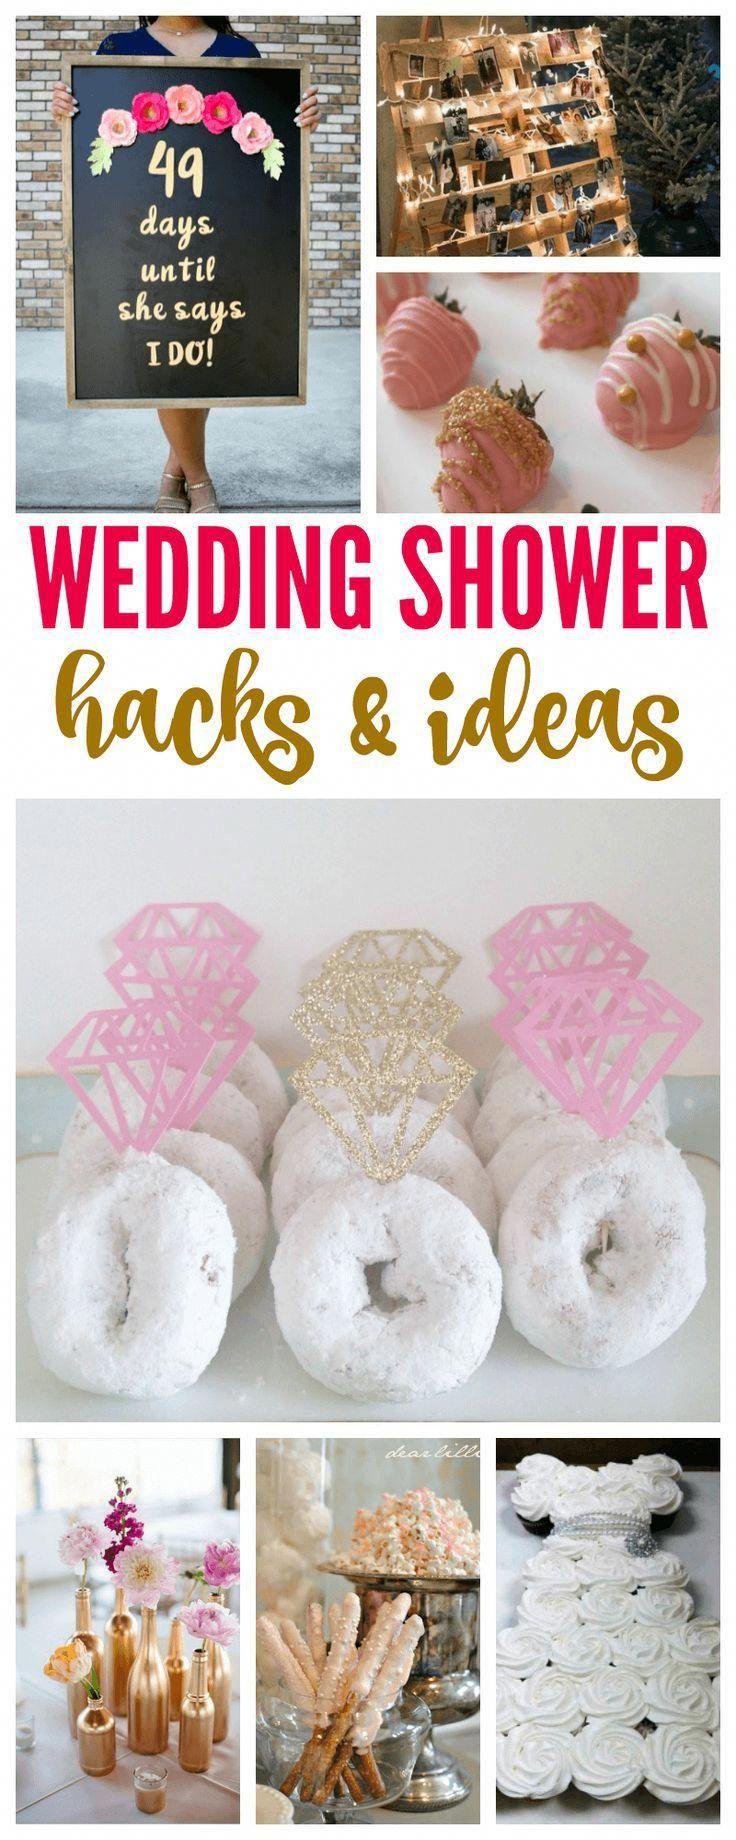 Wedding shower hacks u ideas how to throw the best bridal shower